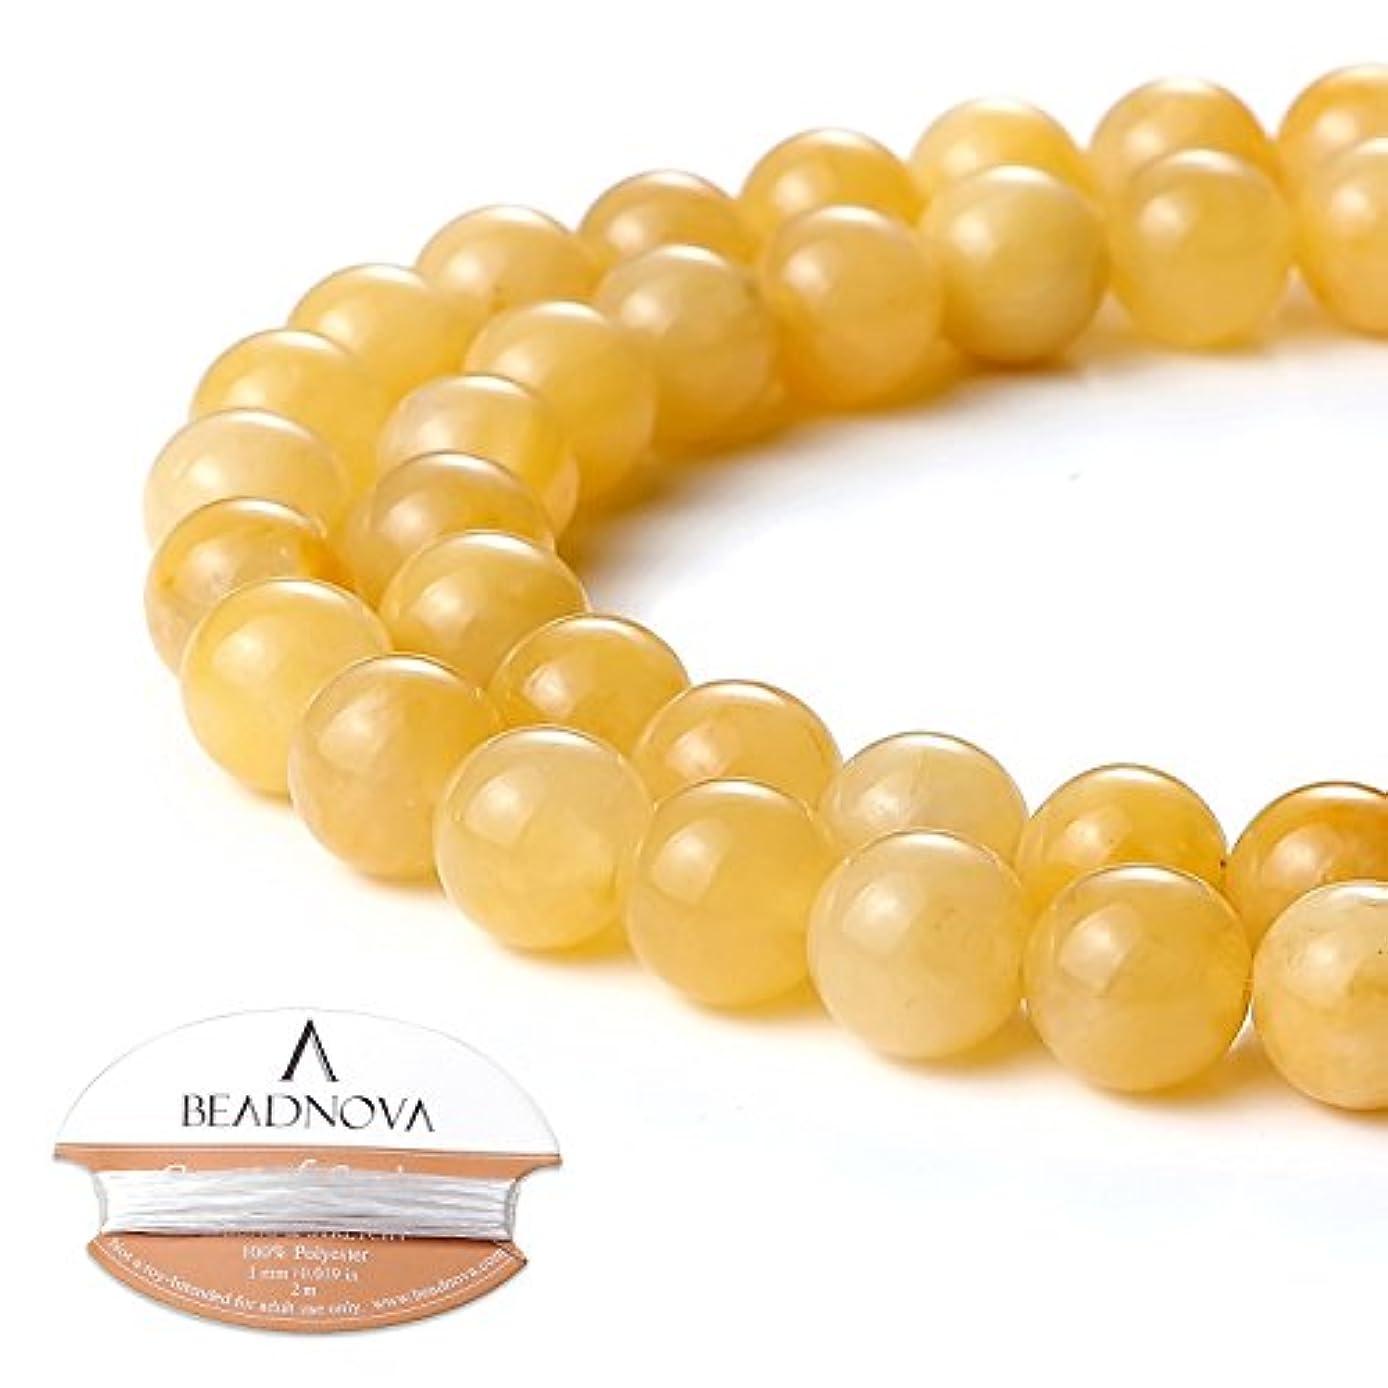 BEADNOVA 8mm Natural Yellow Jade Gemstone Round Loose Beads for Jewelry Making (45-48pcs)